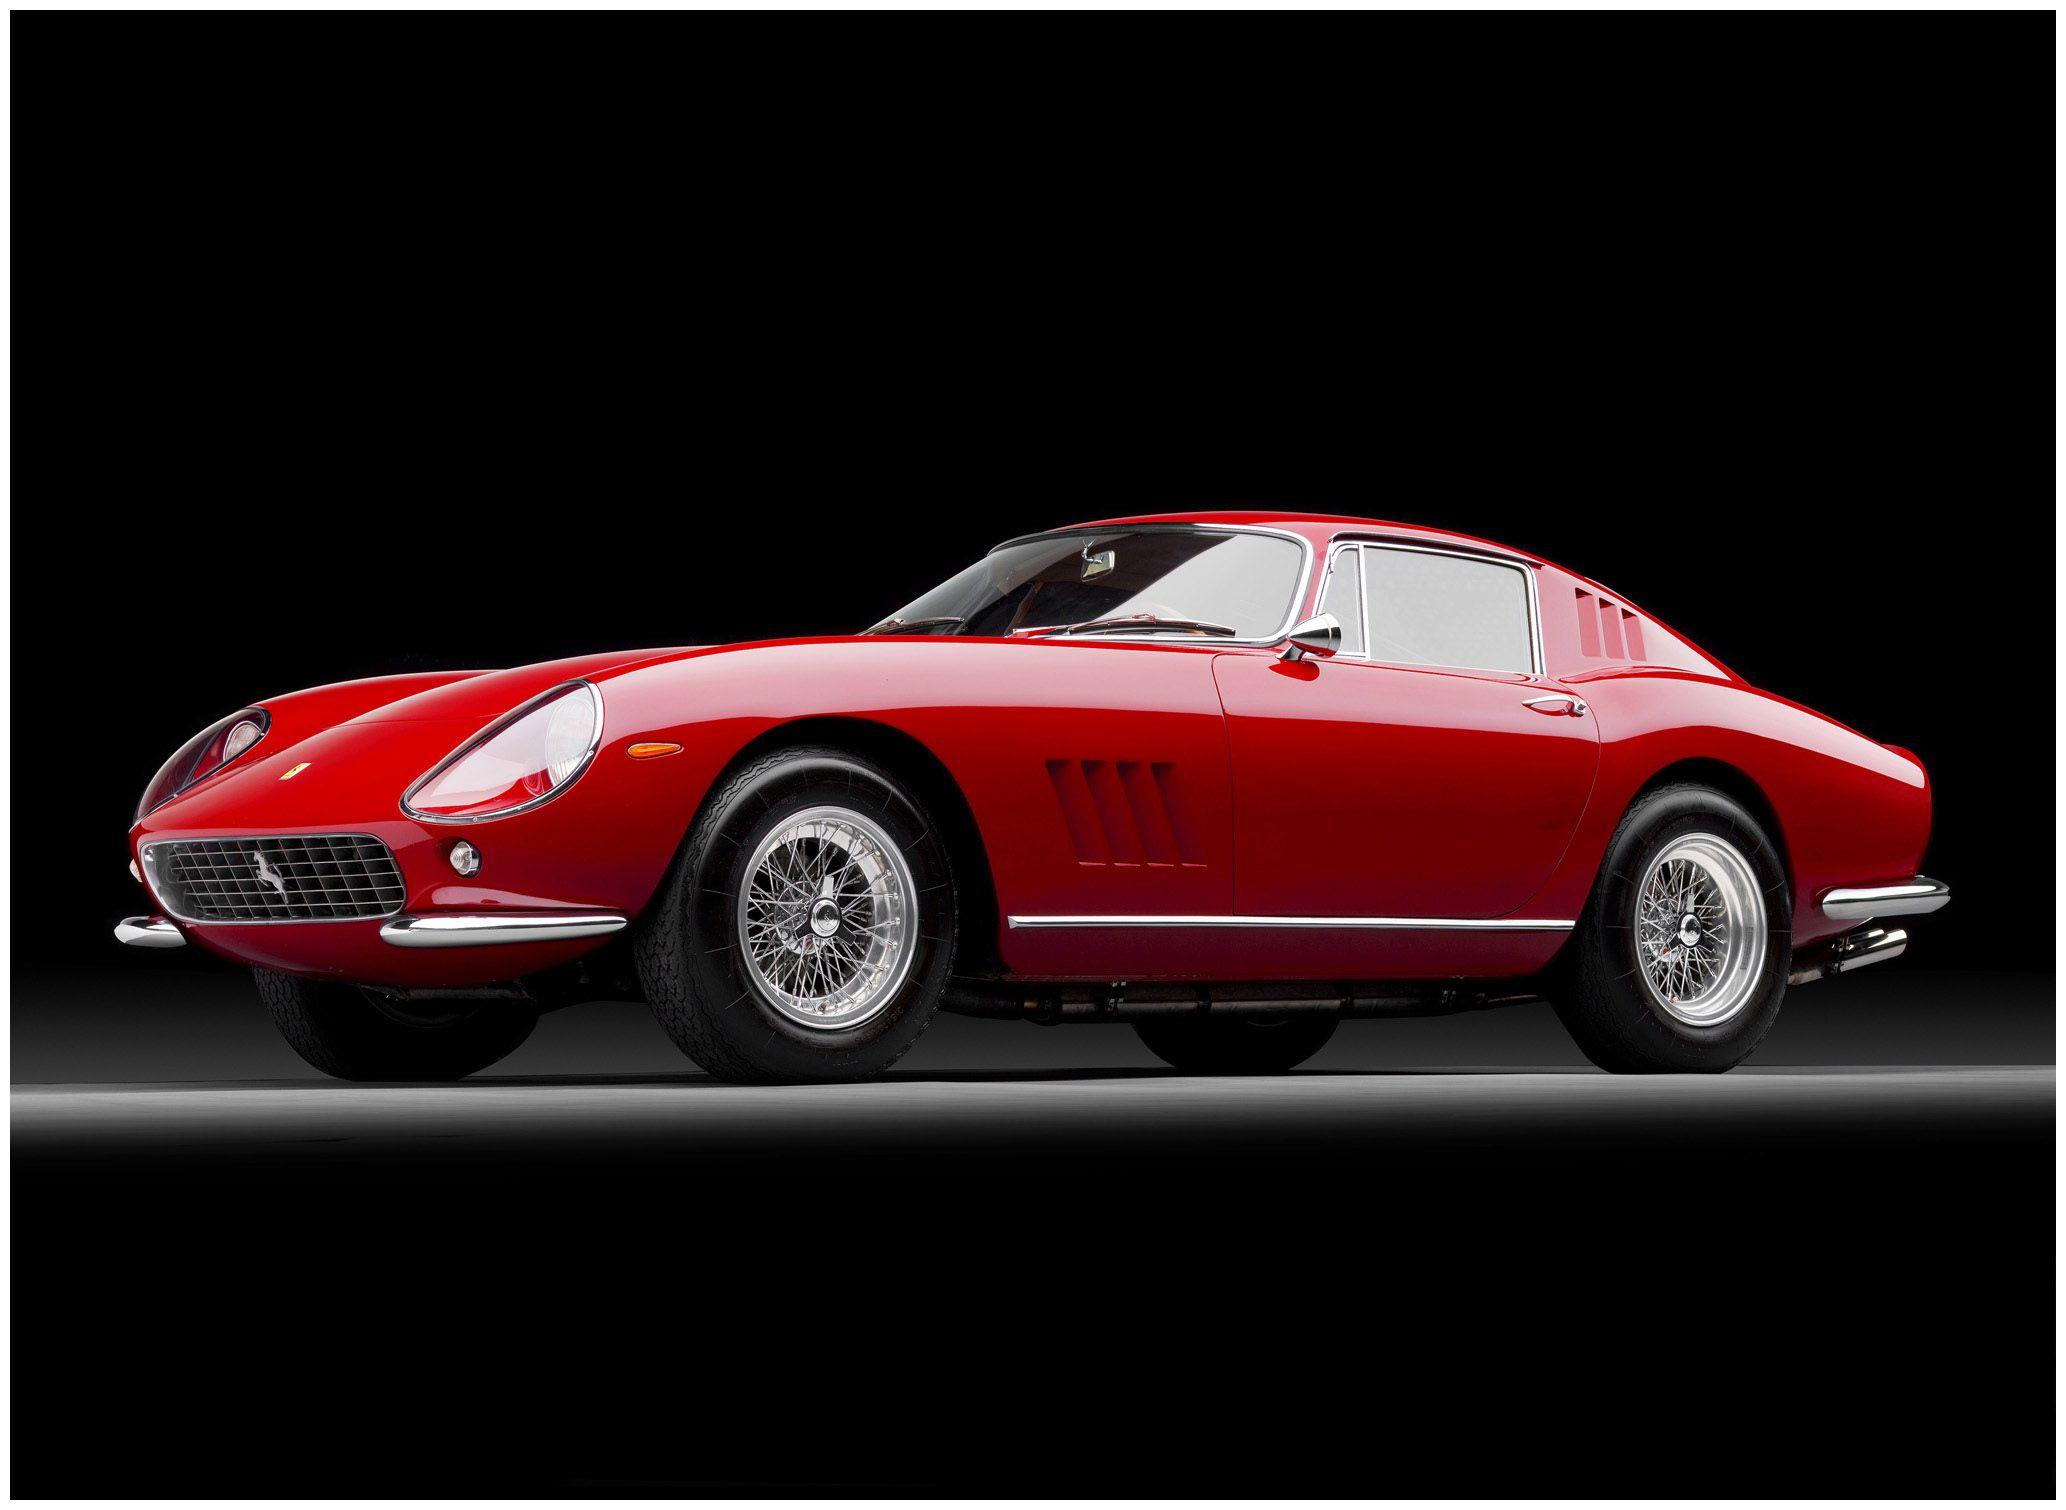 Ferrari 275 gtb 6c scaglietti shortnose 196566 ferrari cars ferrari 275 gtb 6c scaglietti shortnose 196566 vanachro Images